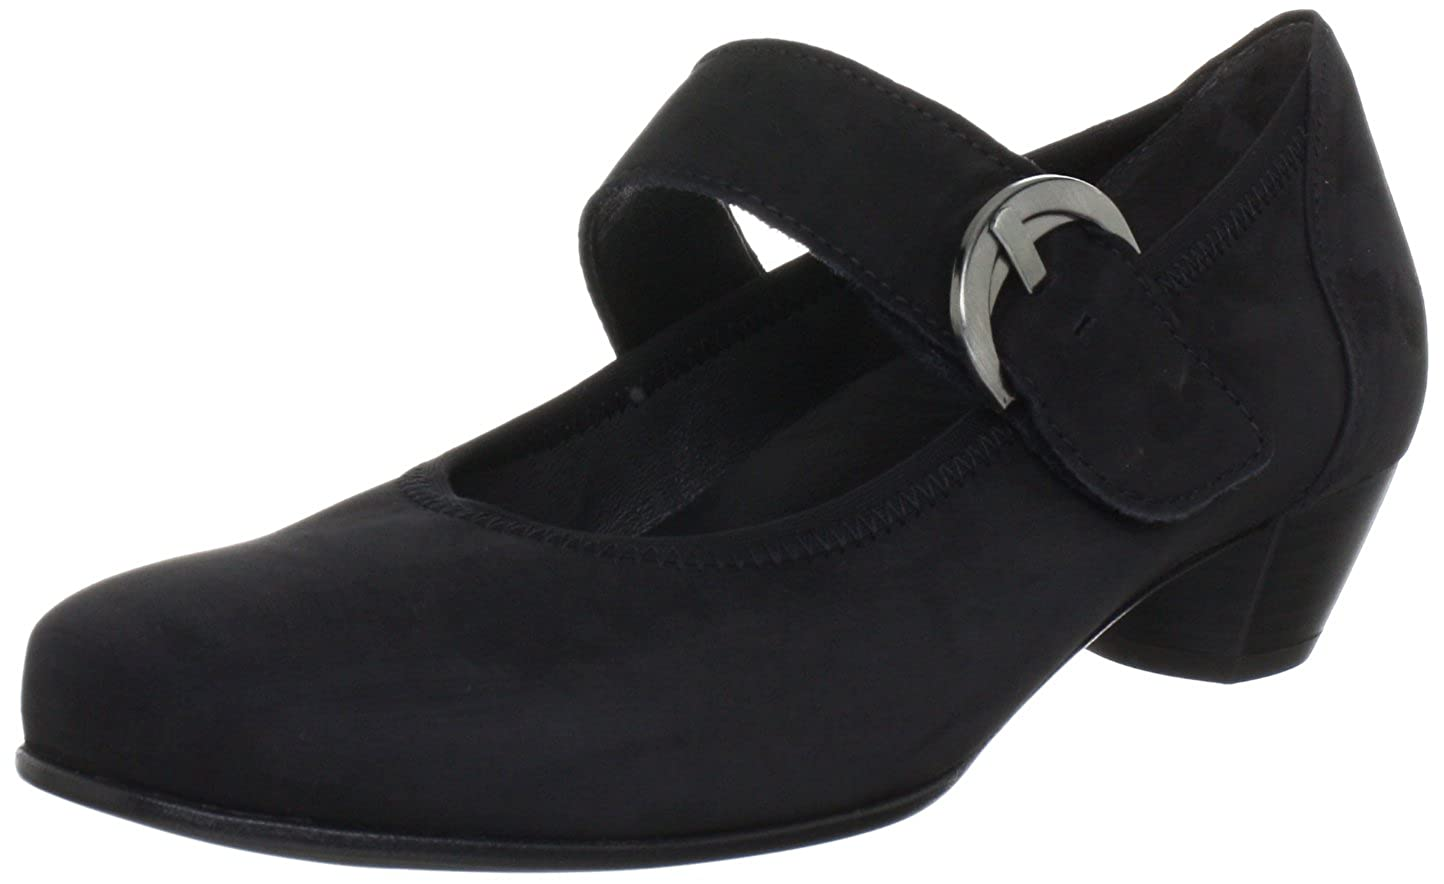 gabor pumps grau silber, GABOR Ankle Boot wine Damen